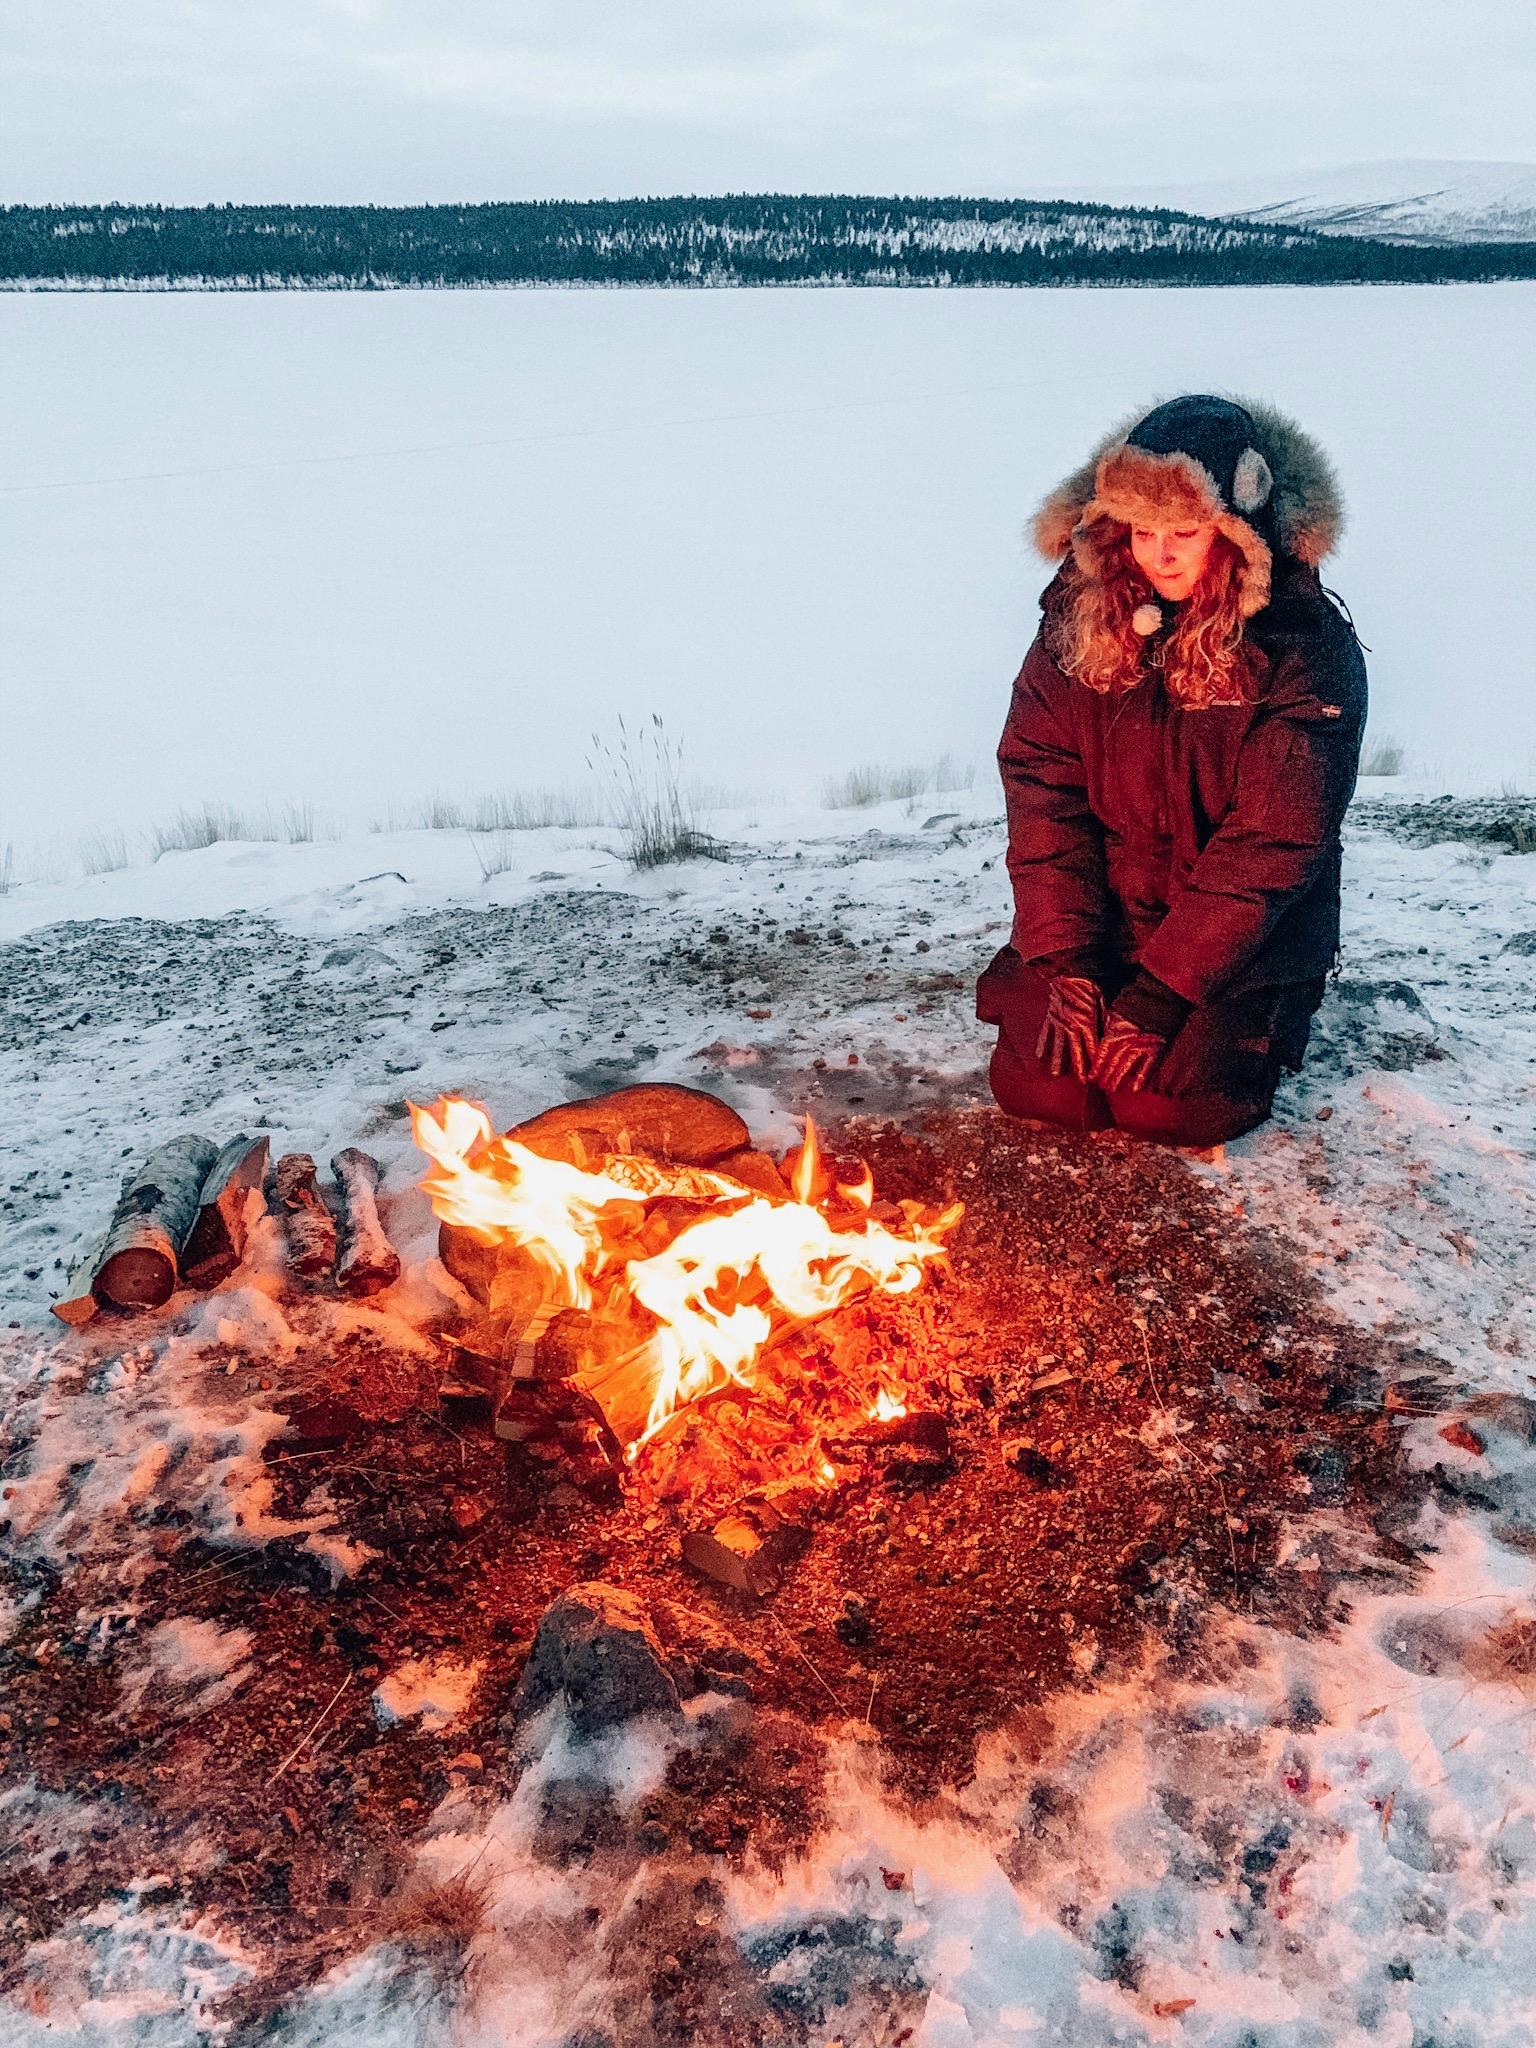 camp-fire-sweden-lapland.jpg